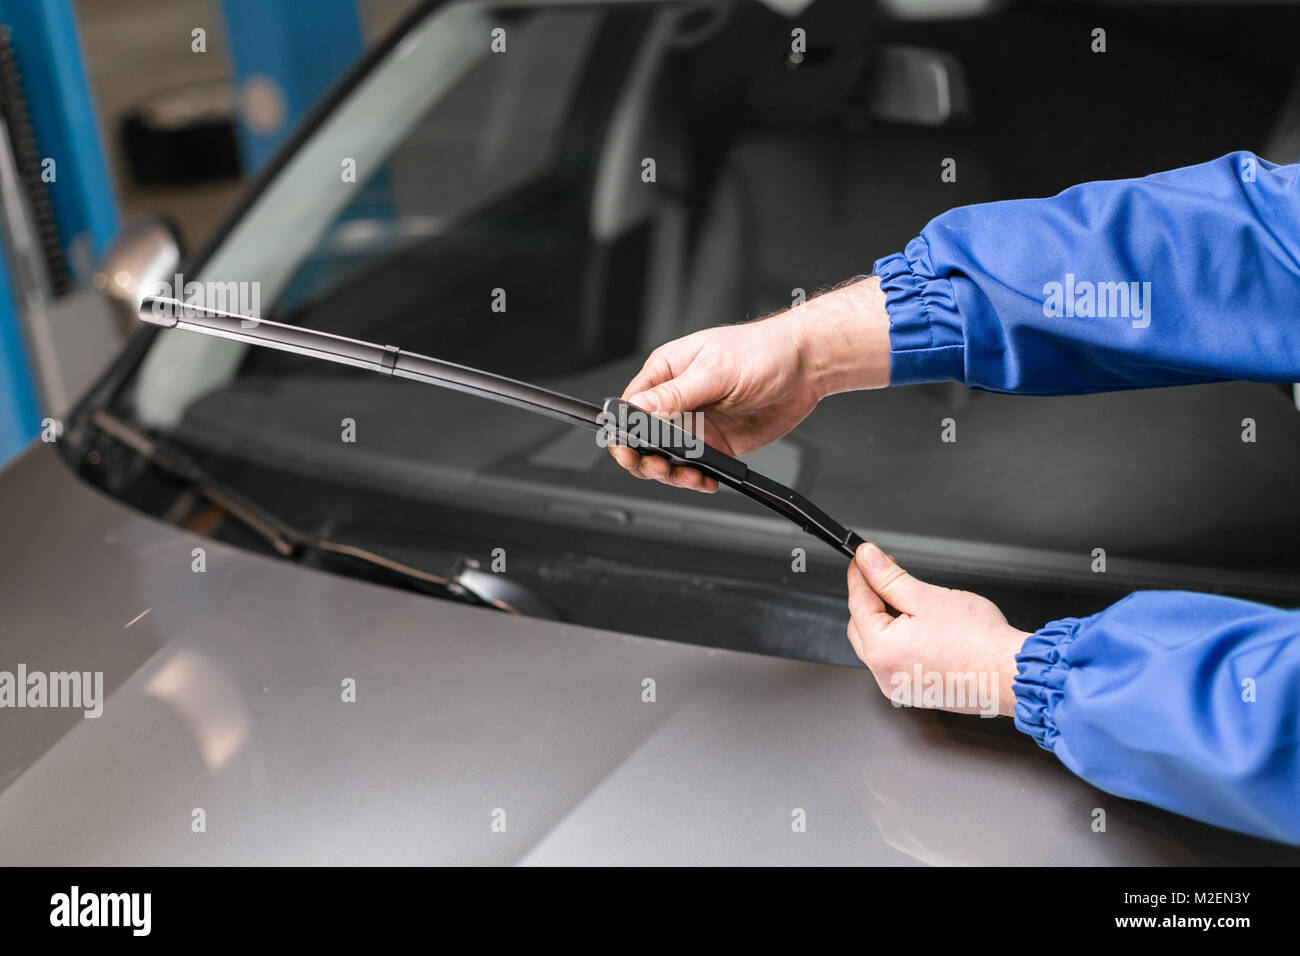 Where to change the windshield in Ufa 52